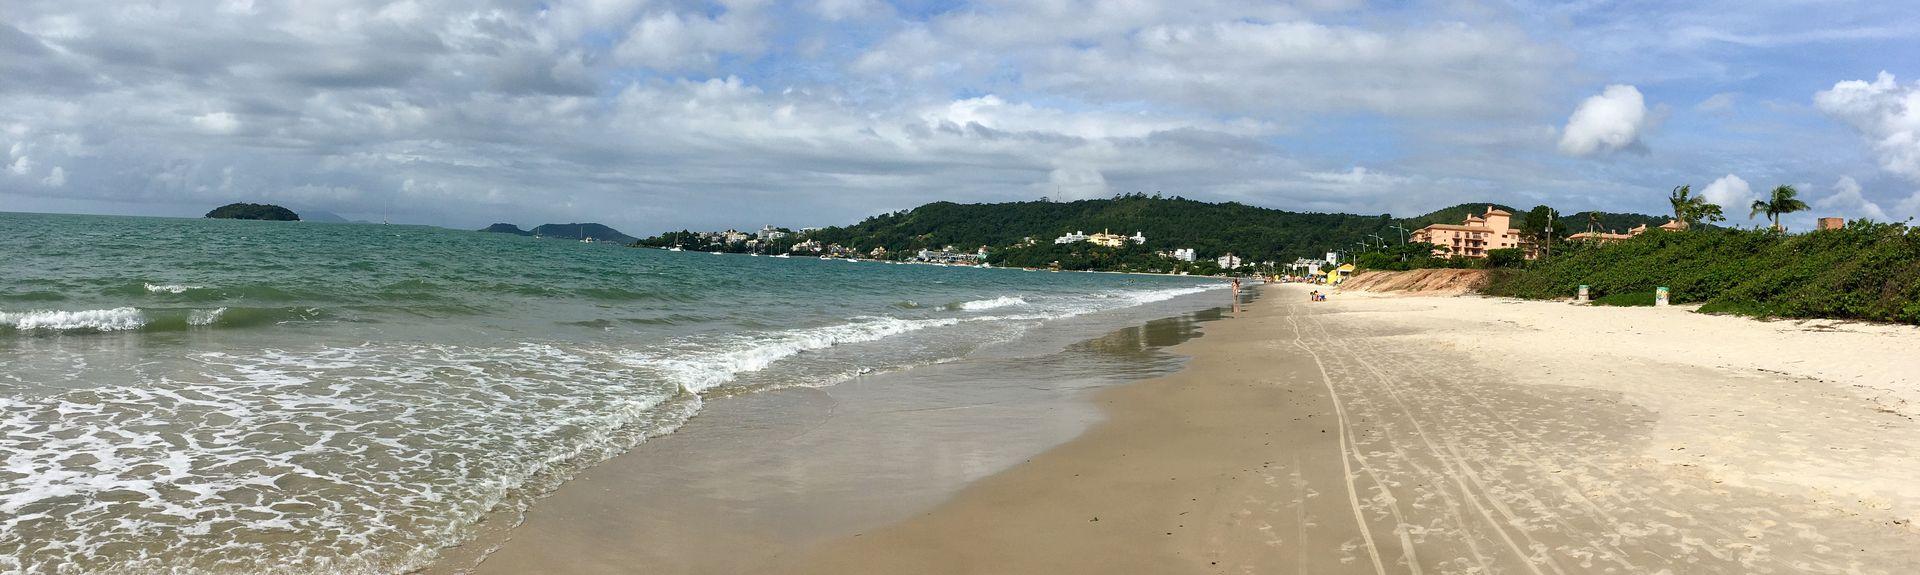 Jurerê, Florianópolis - State of Santa Catarina, Brazil